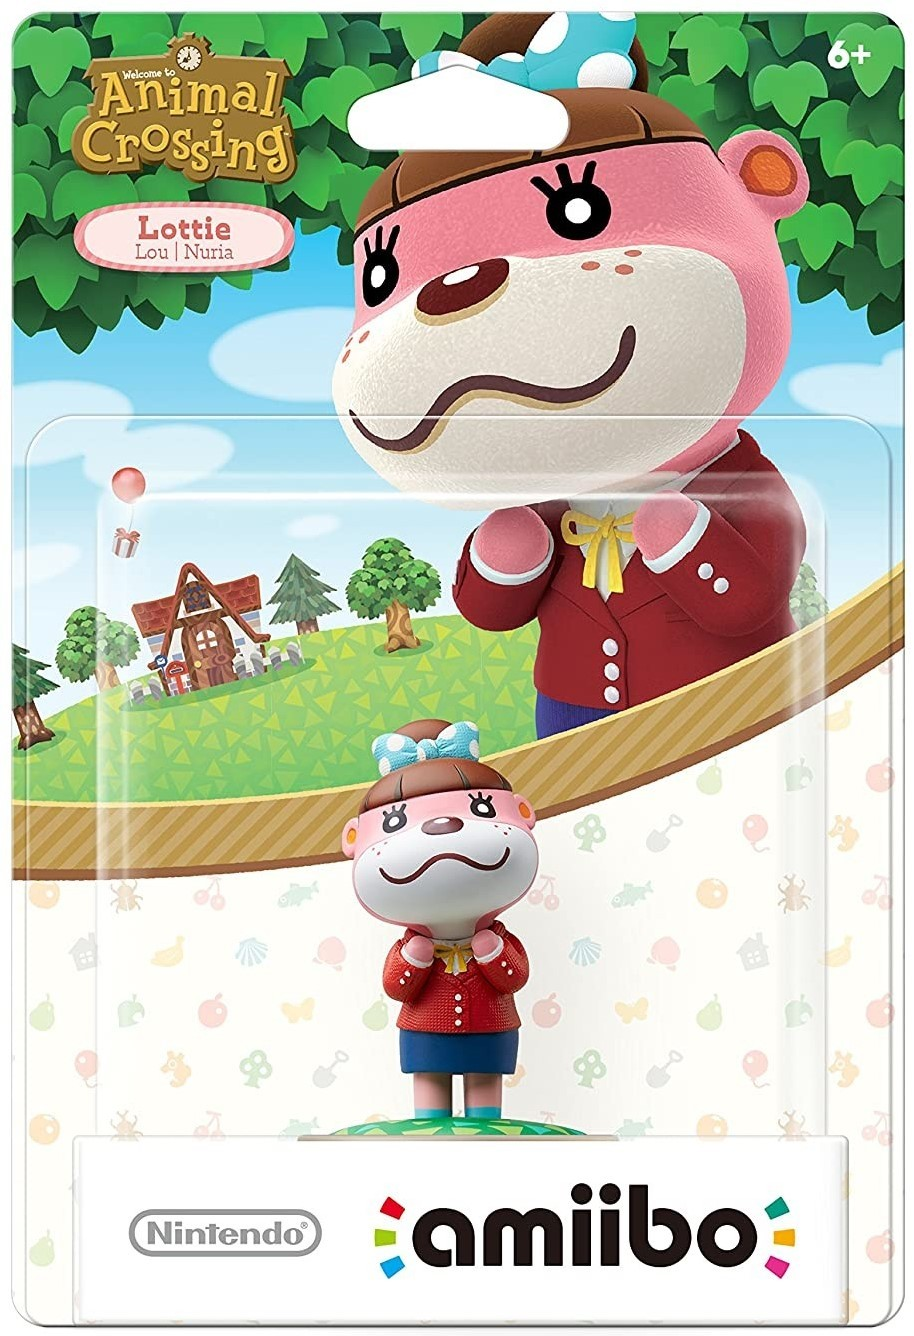 Animal Crossing Series: Интерактивная фигурка amiibo – Lottie